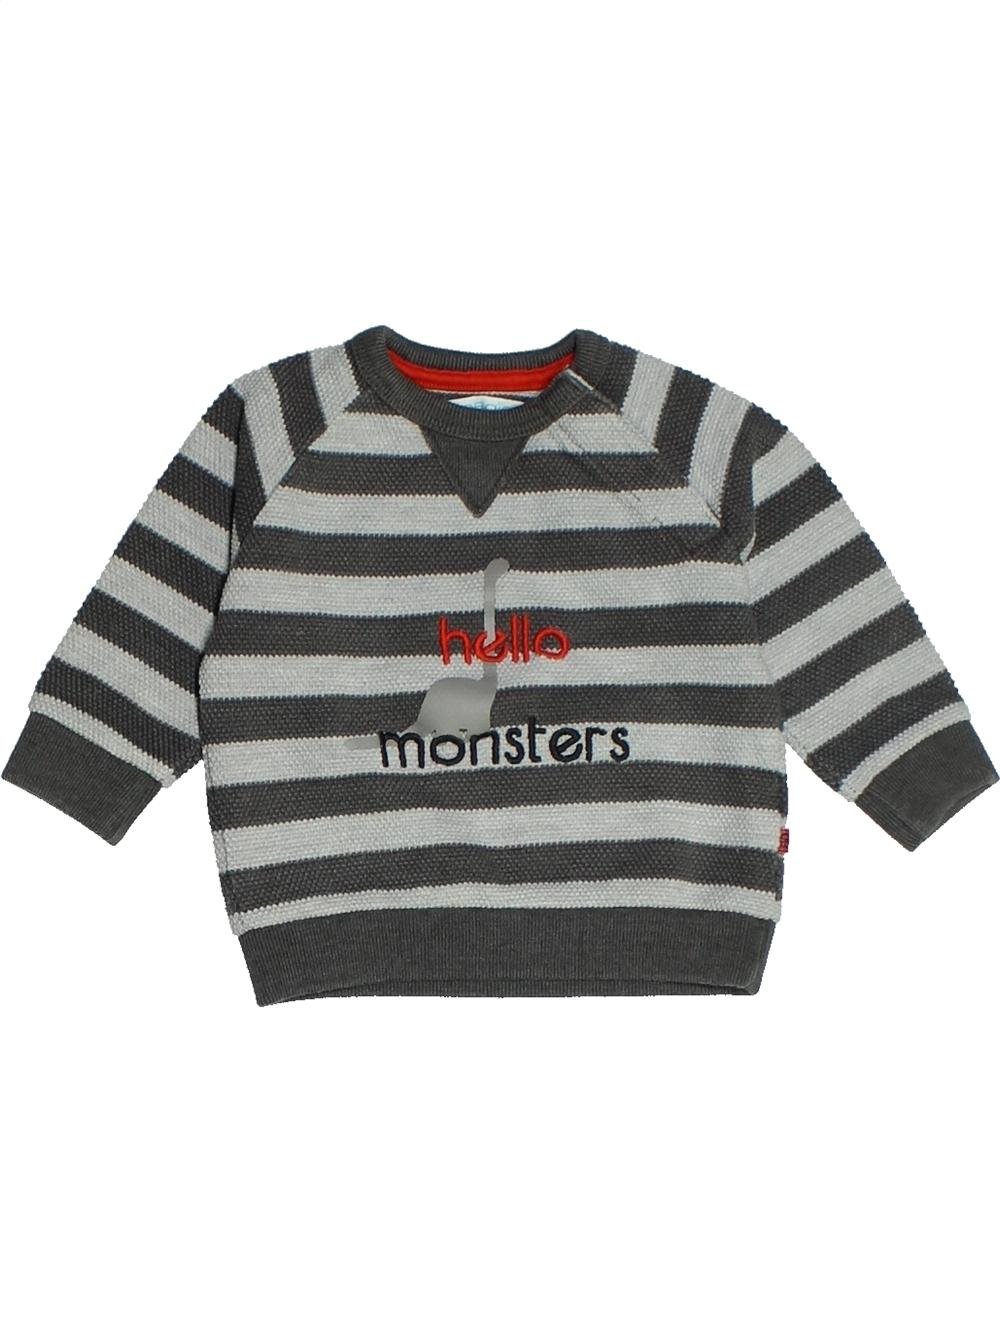 Sweat-bebe-garcon-OKAIDI-6-mois-gris-hiver-vetement-bebe-1098806